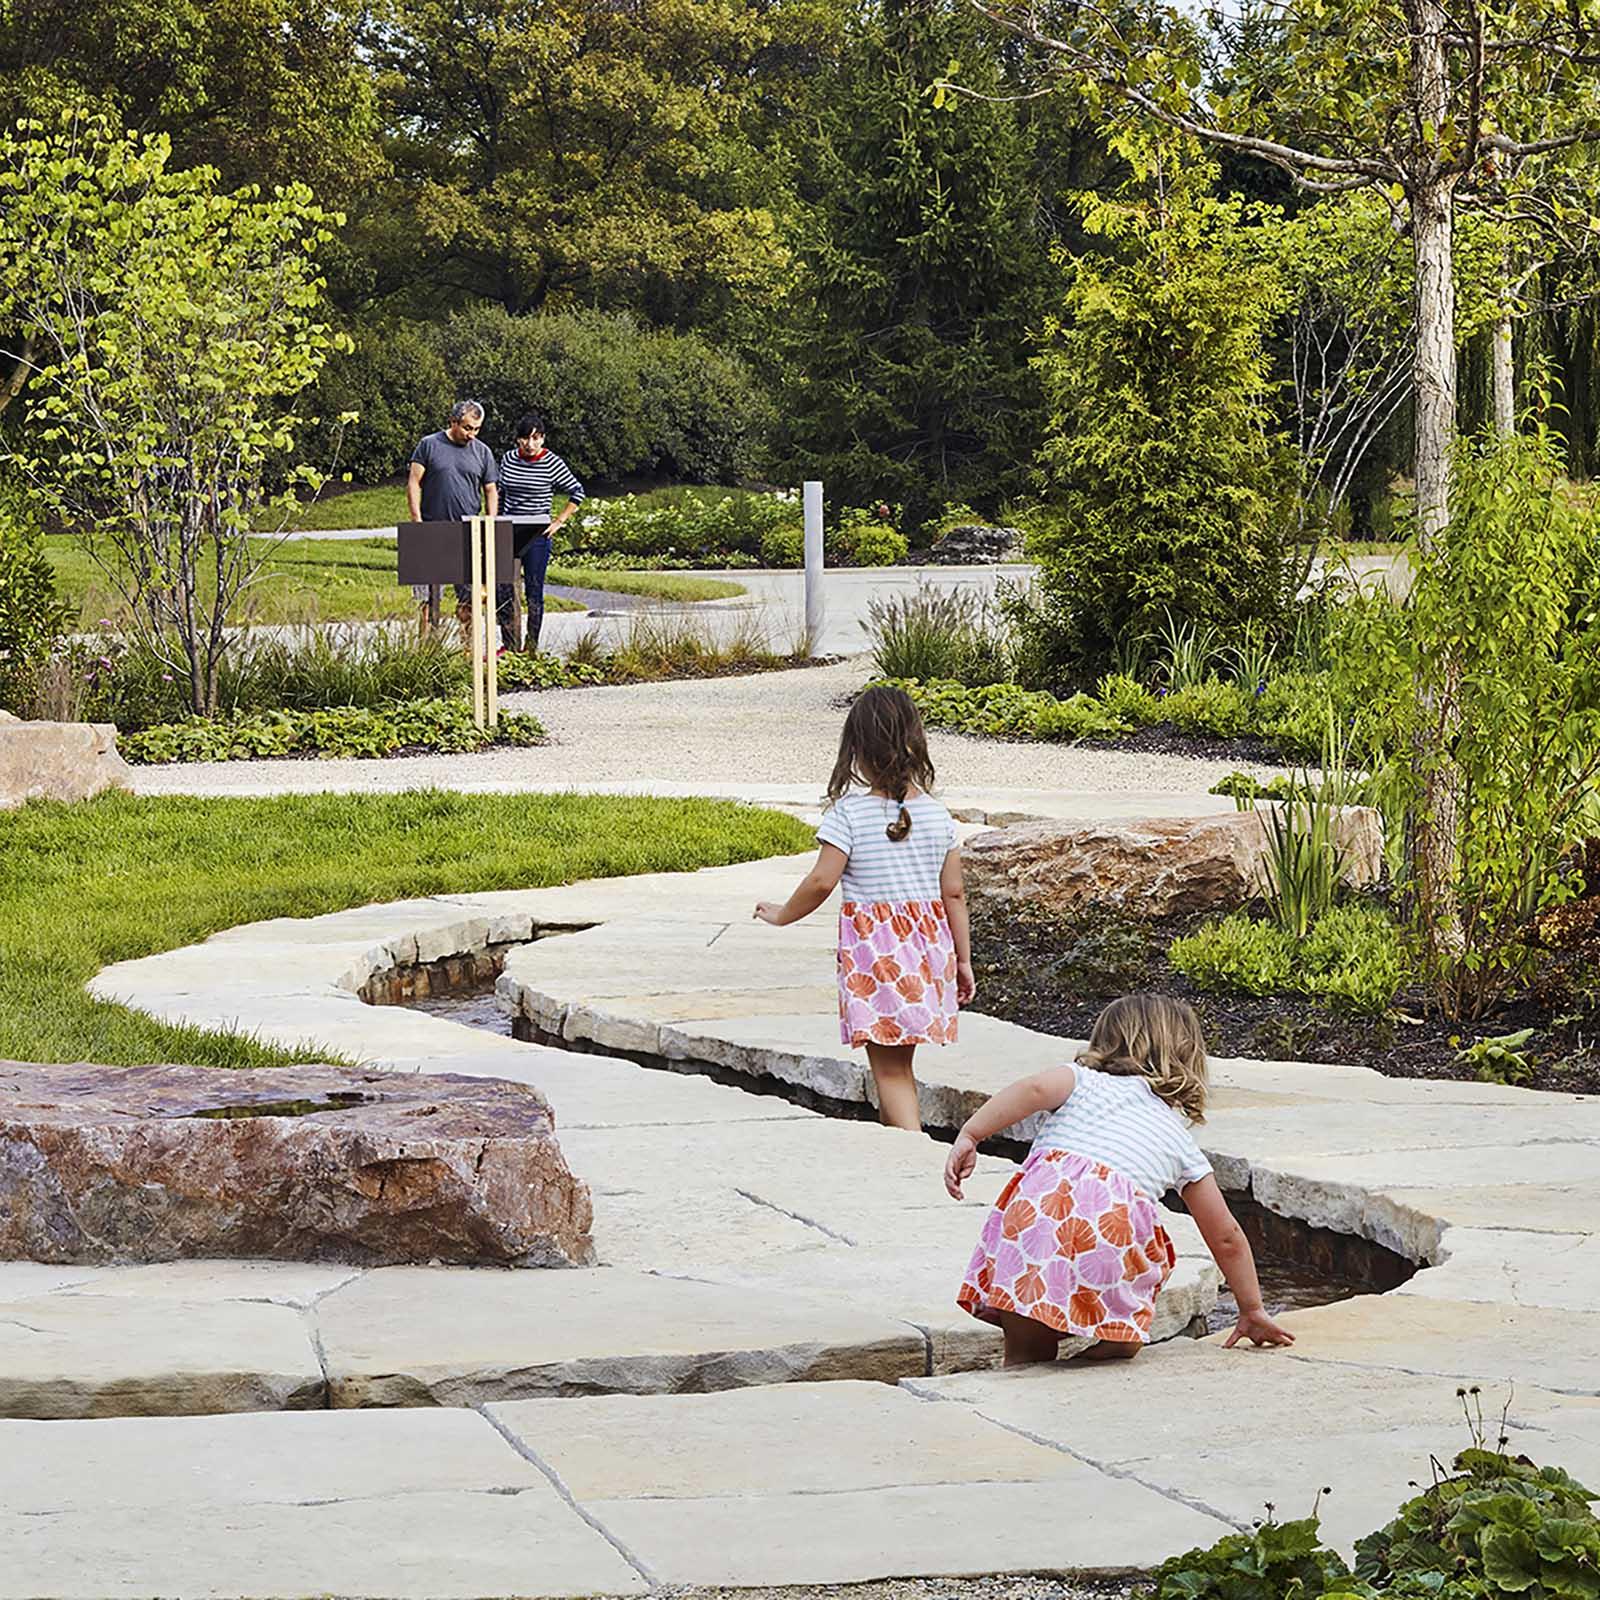 Regenstein Learning Campus Botanic Garden by Mikyoung Kim.